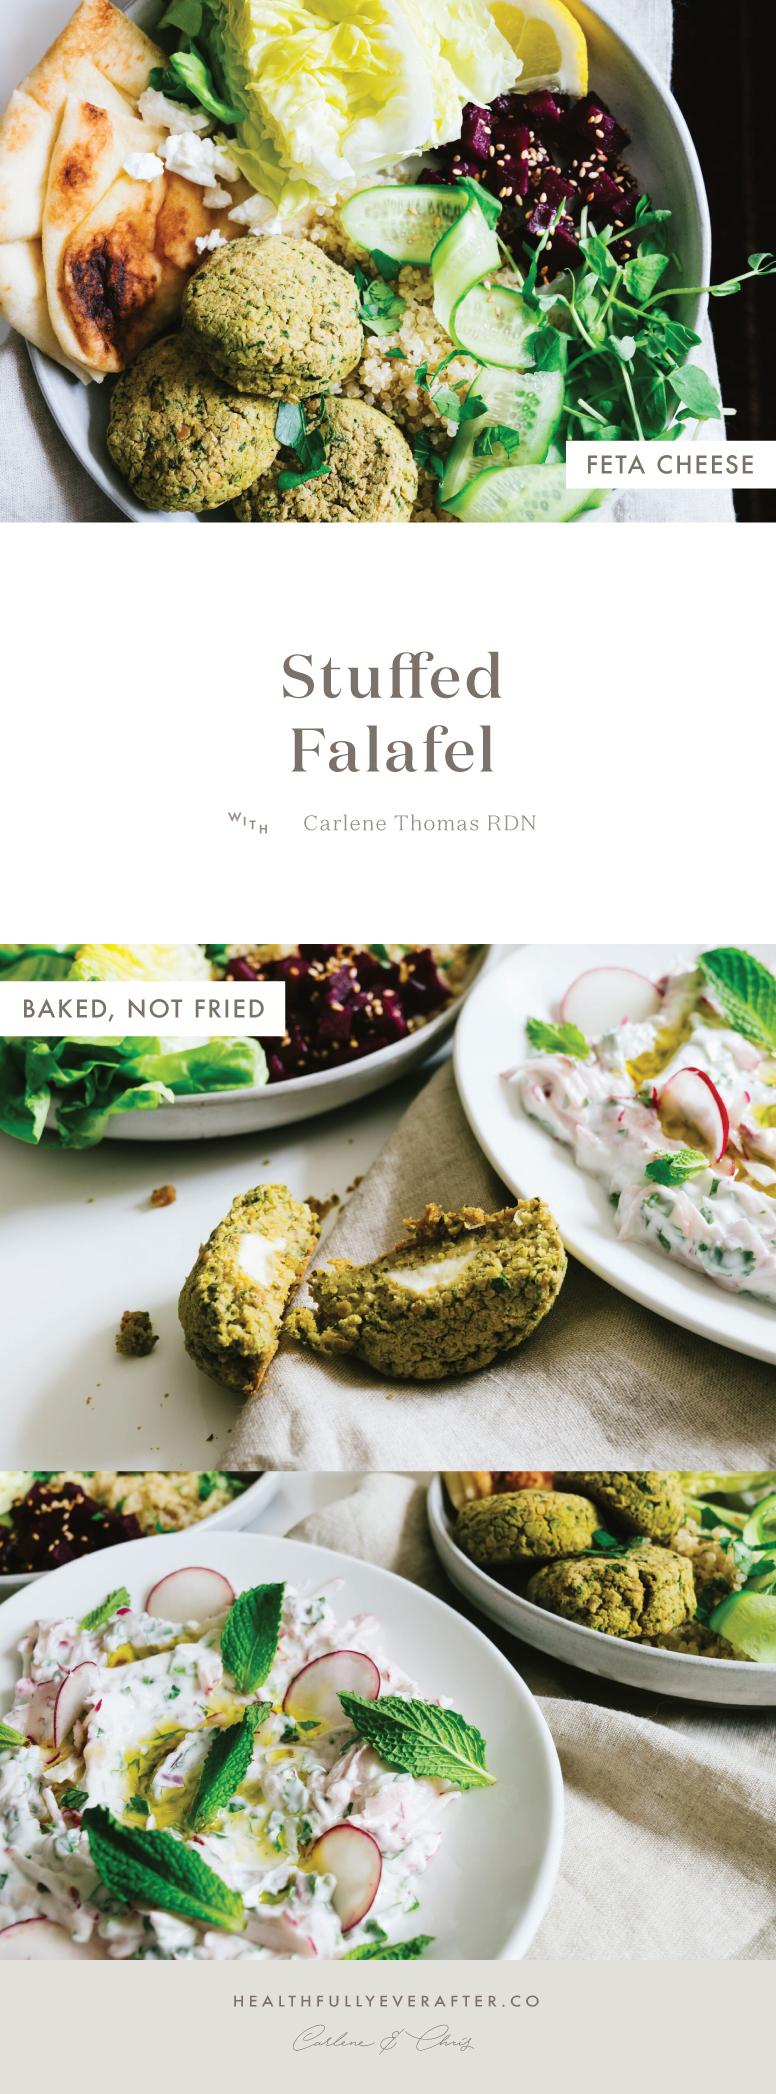 feta baked and stuffed falafel bowl